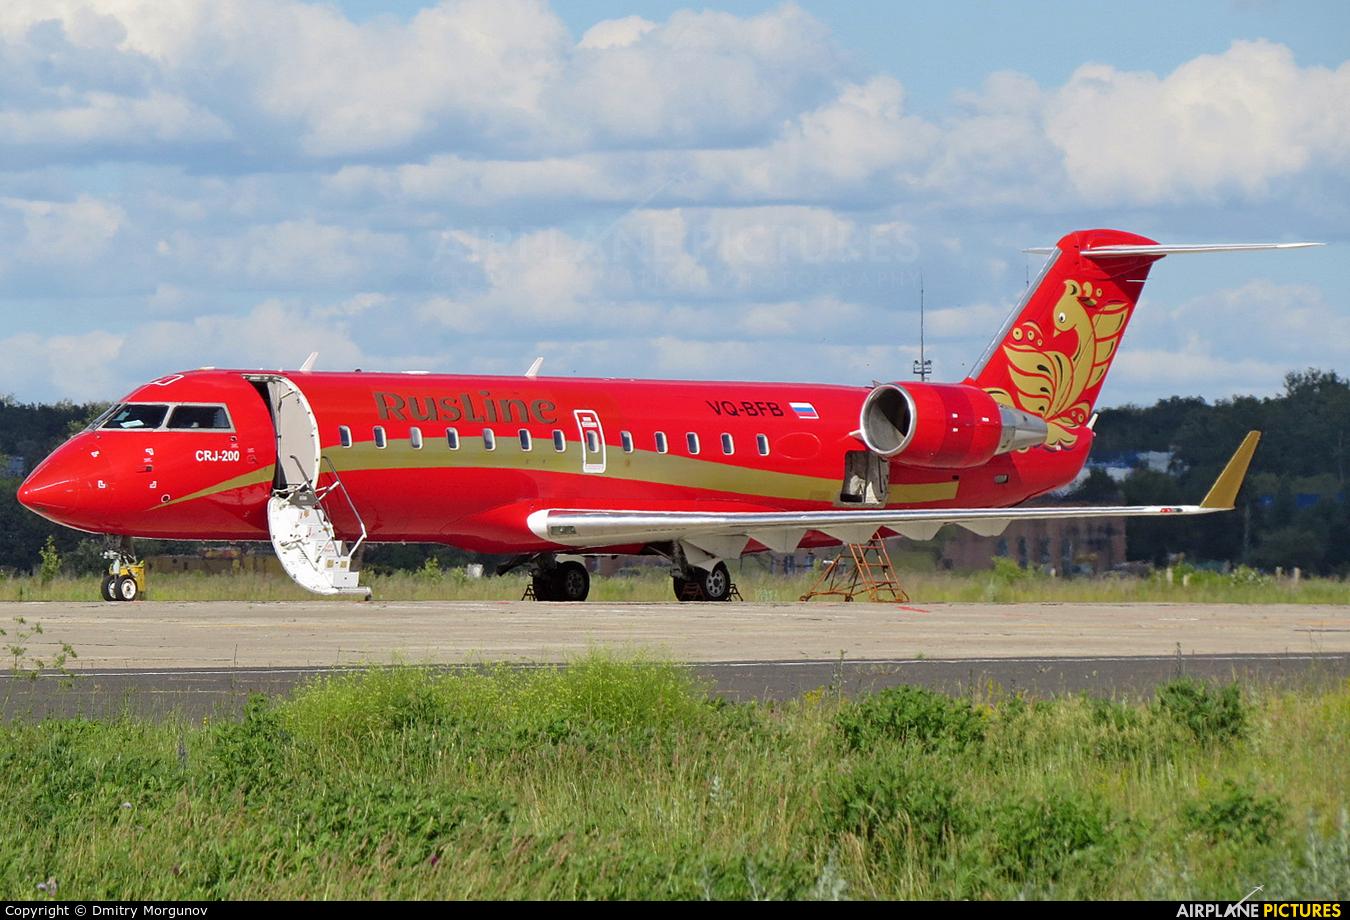 Rusline VQ-BFB aircraft at Kursk Vostochny